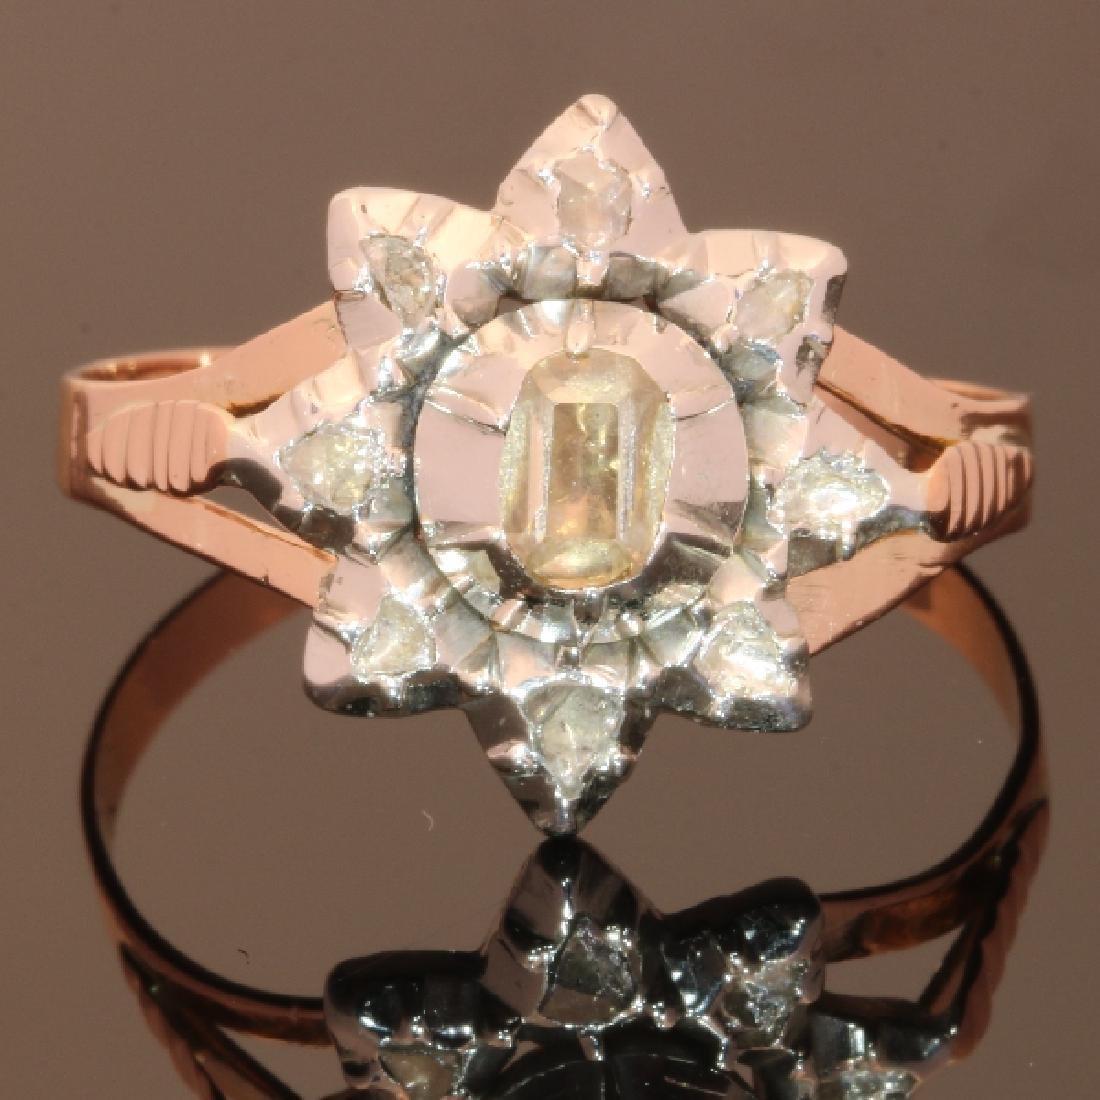 Antique 18K Gold Rose Cut Diamond Ring, c1780